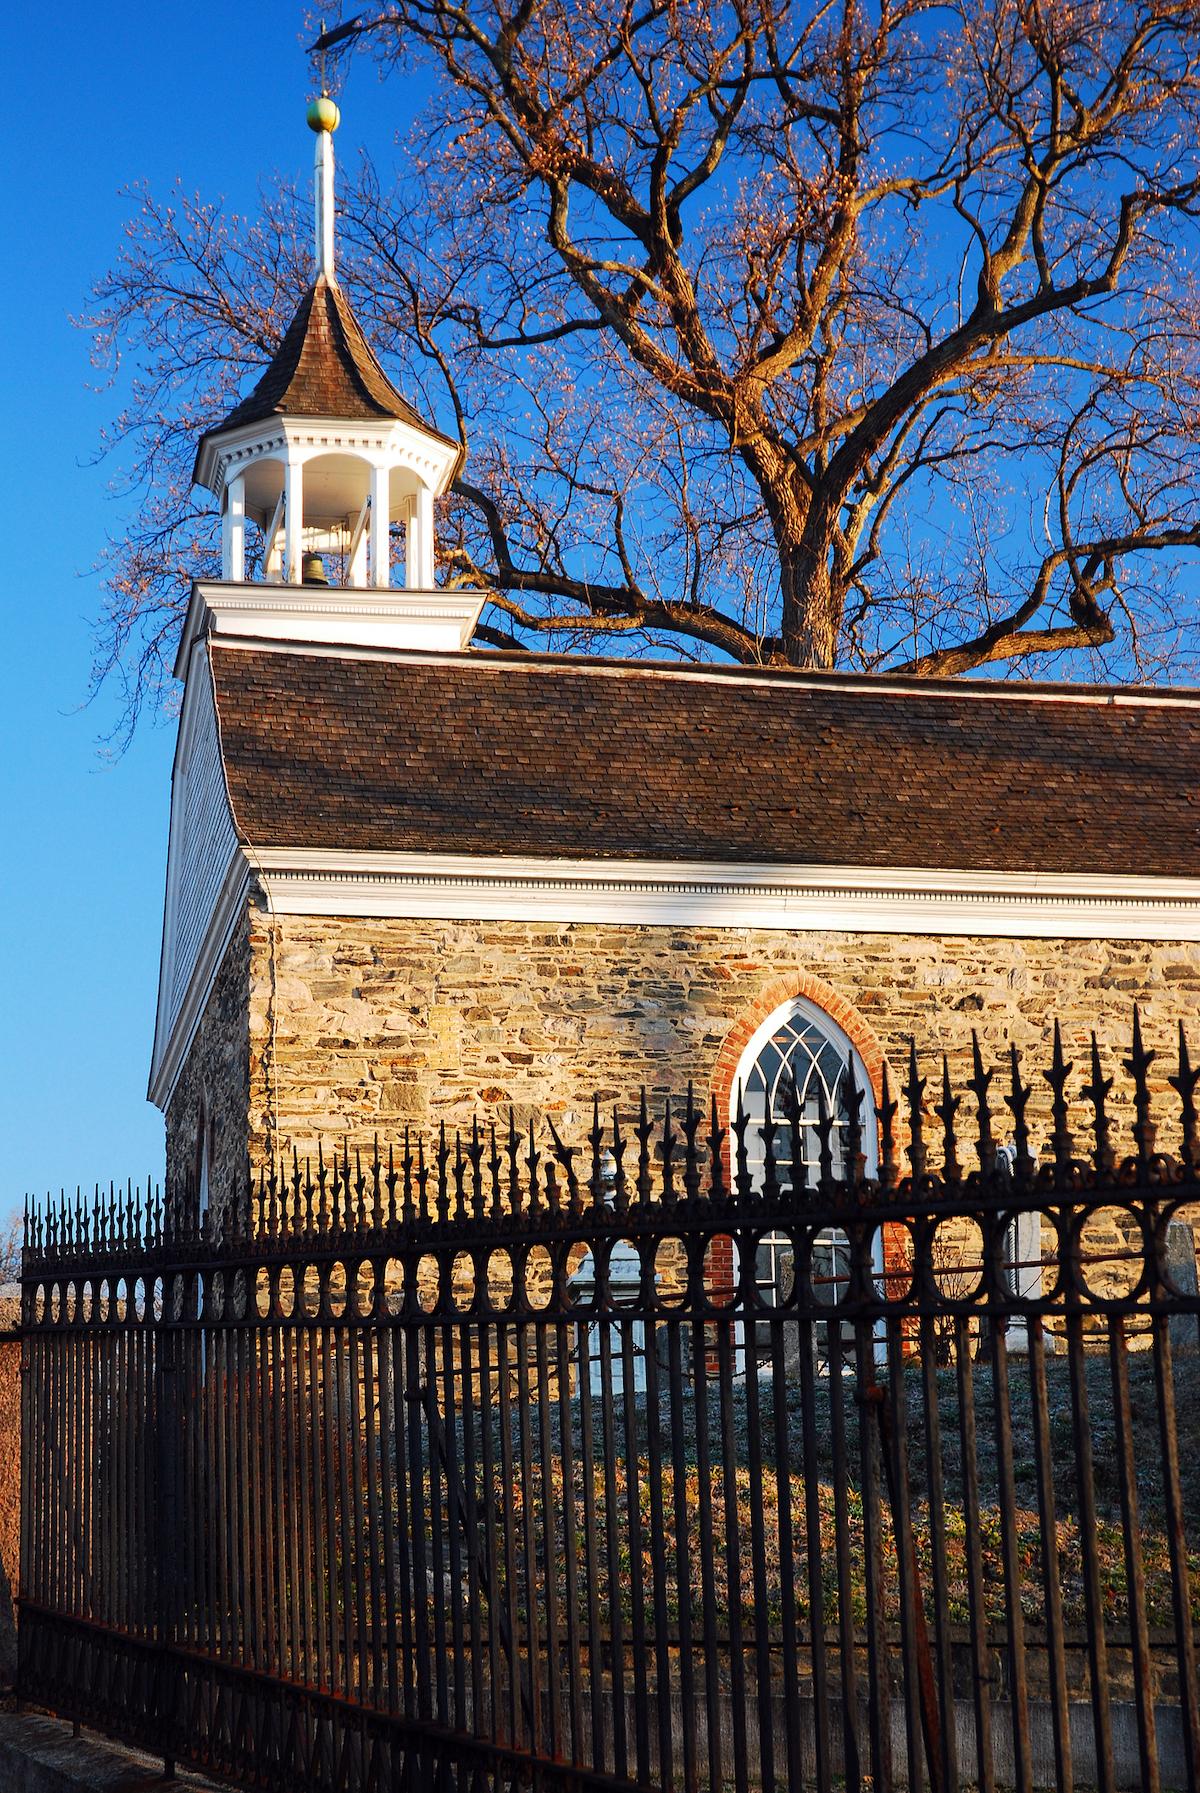 Stone exterior of the Old Dutch Church in Sleepy Hollow NY.